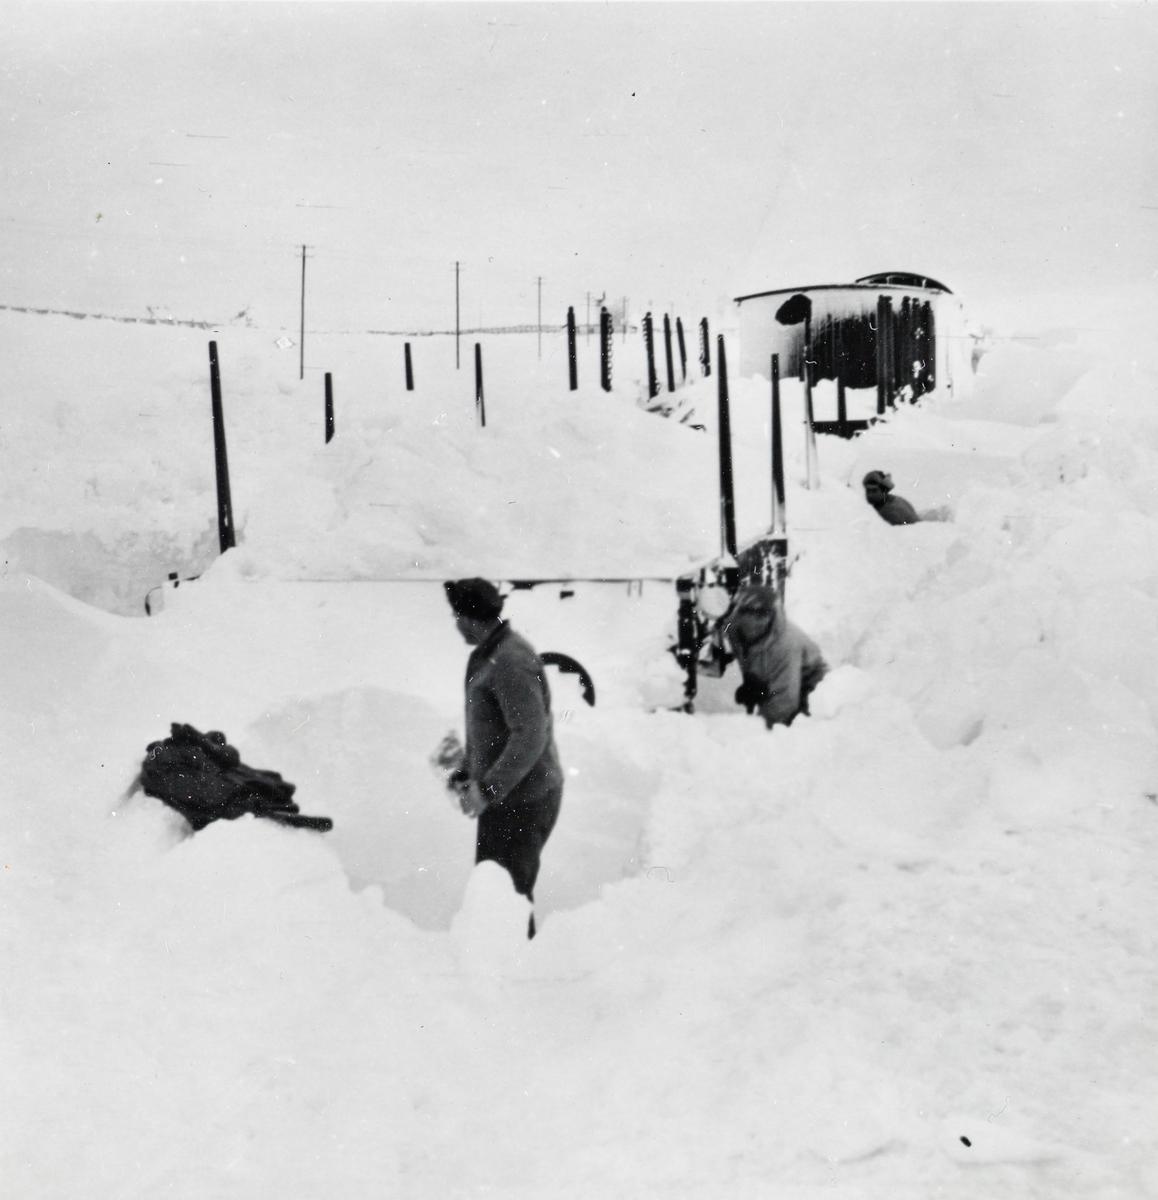 Toget fra Mo i Rana til Lønsdal har kjørt seg fast i snøen på Saltfjellet. Jernbanepersonalet arbeider med å spa løs toget.